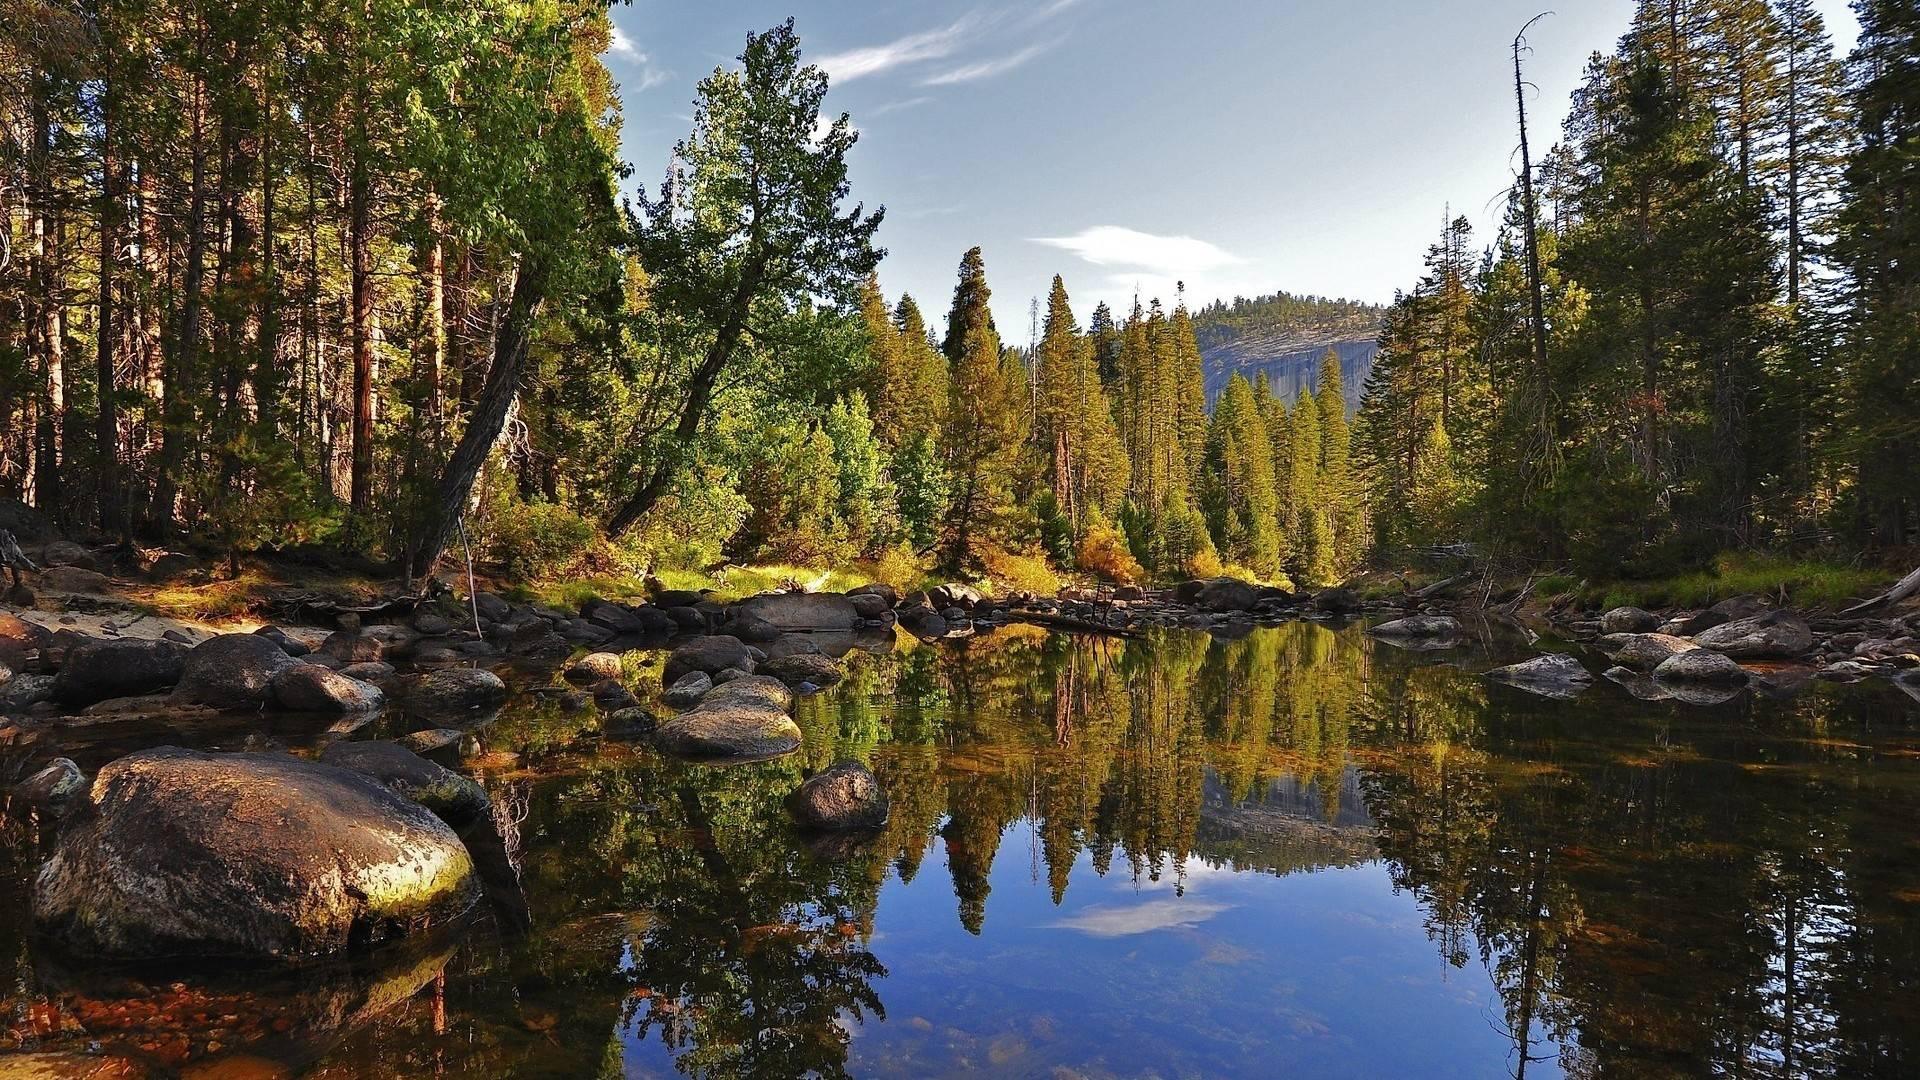 Forest Desktop Backgrounds Free Group (79+)